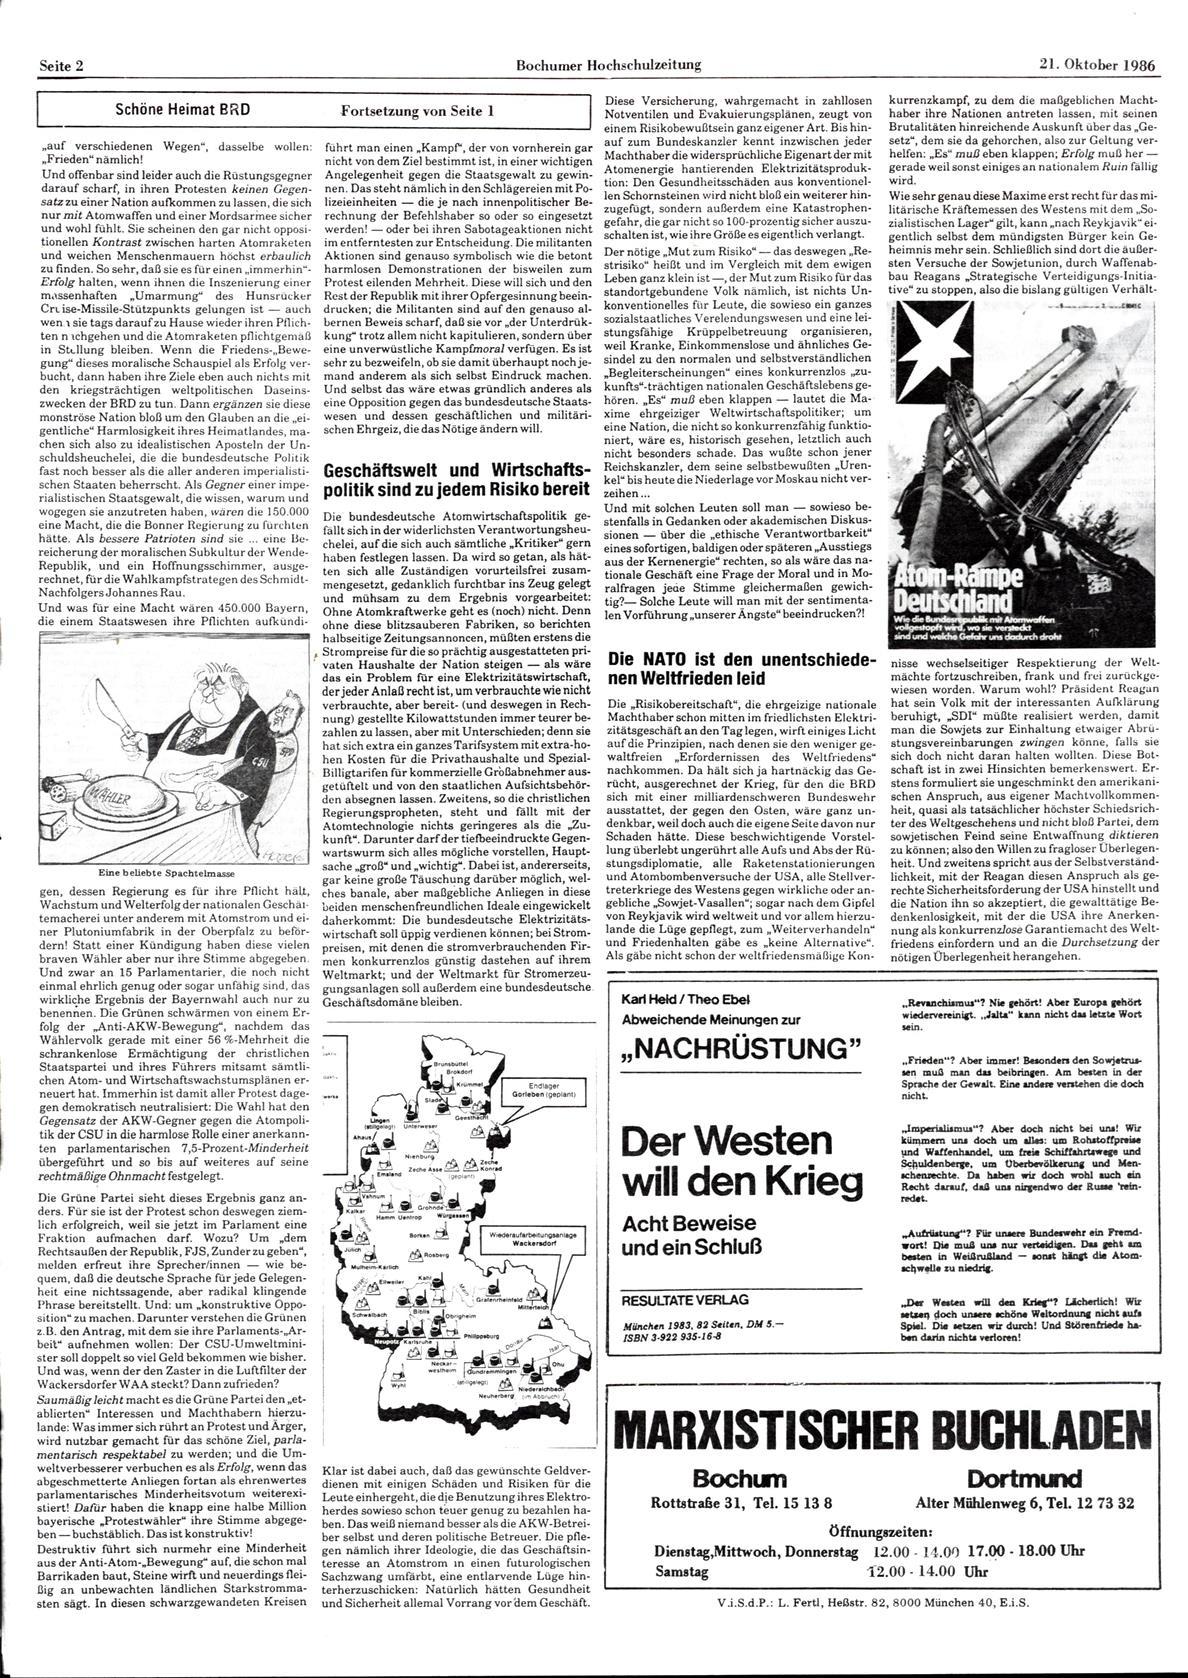 Bochum_BHZ_19861021_136_002